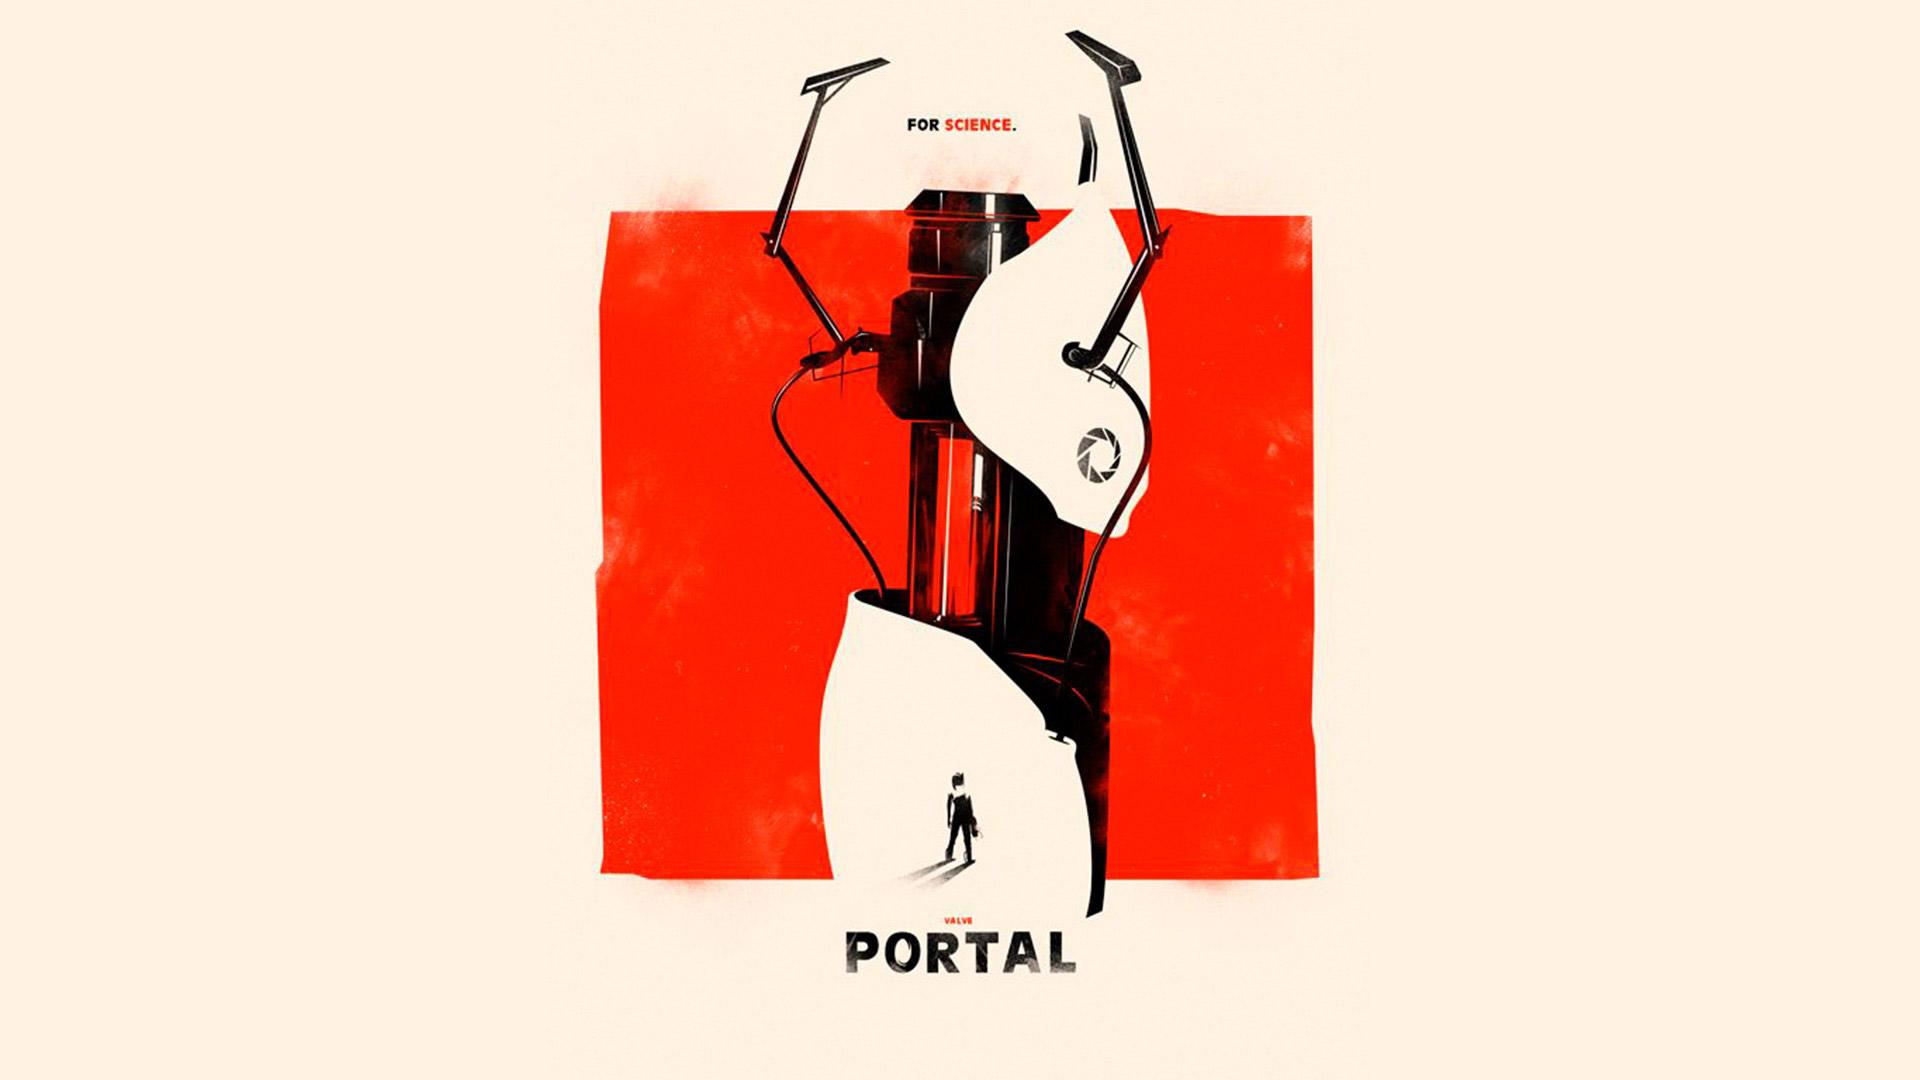 Free Portal Wallpaper in 1920x1080